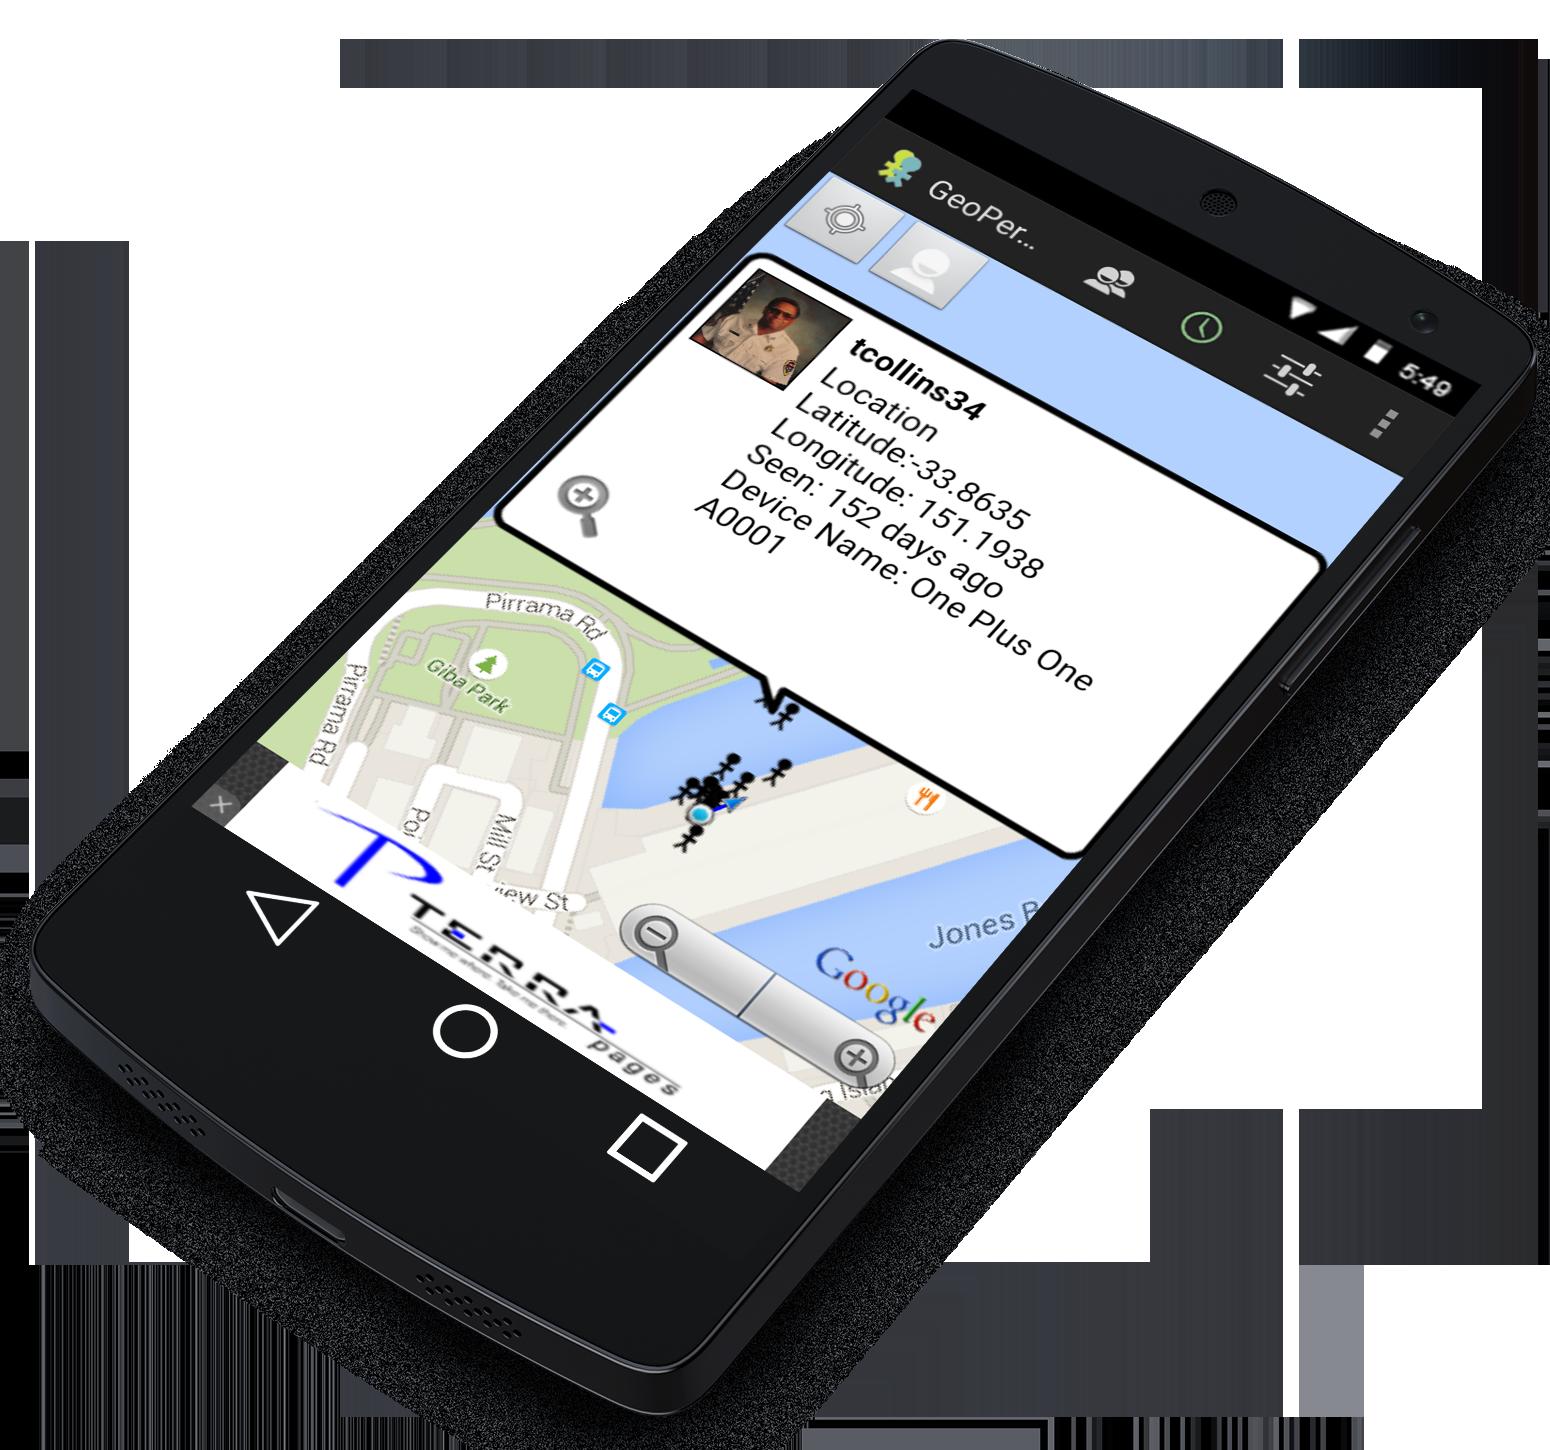 Nexus 5 for app marketing flipped